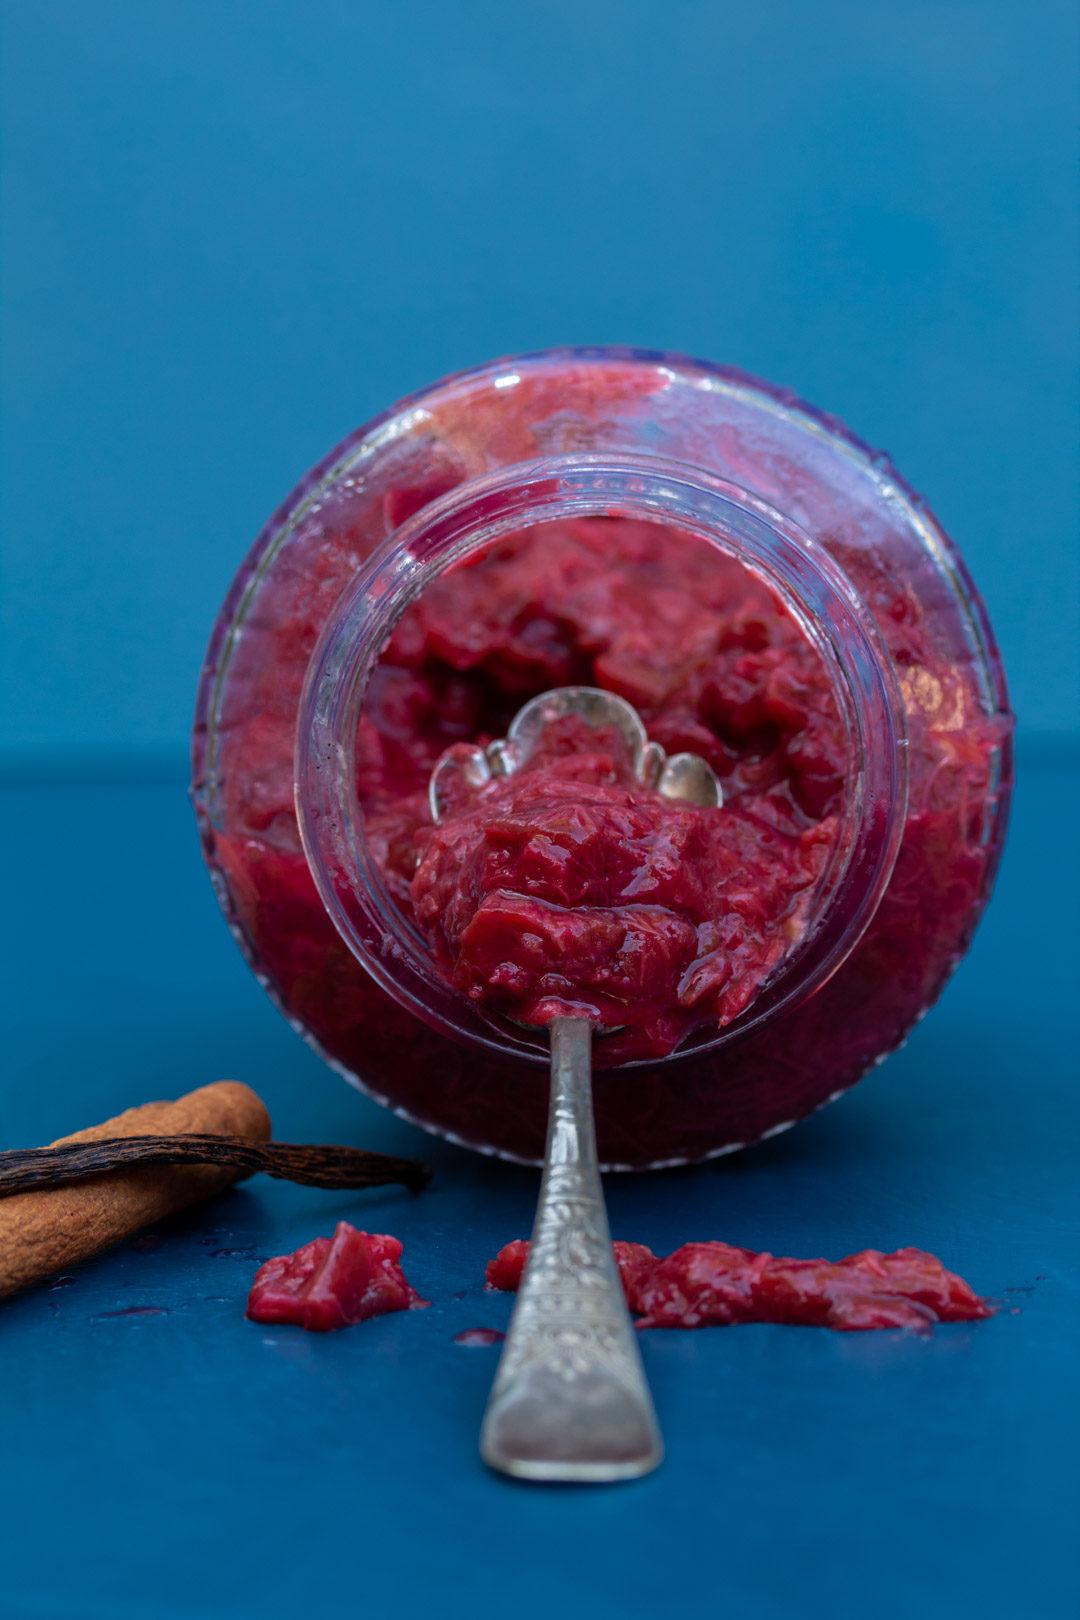 rhubarb compote inside jar